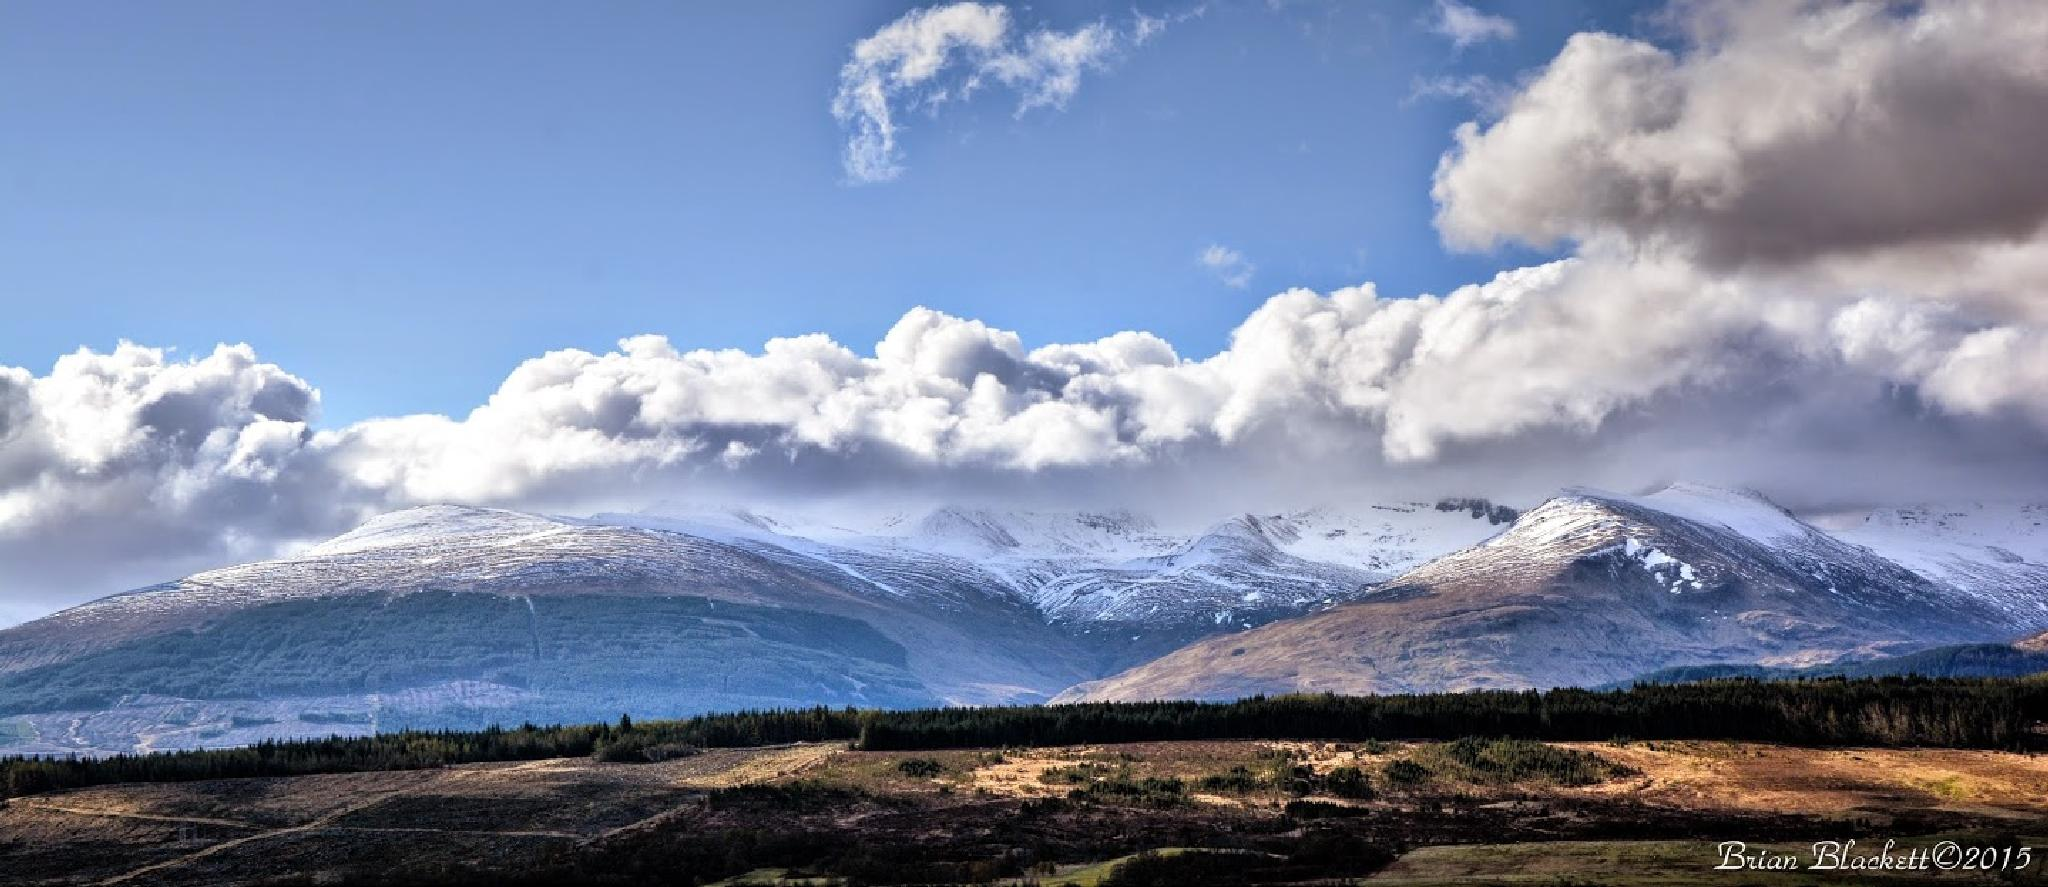 Scottish Highlands May 2015 by brianblackett